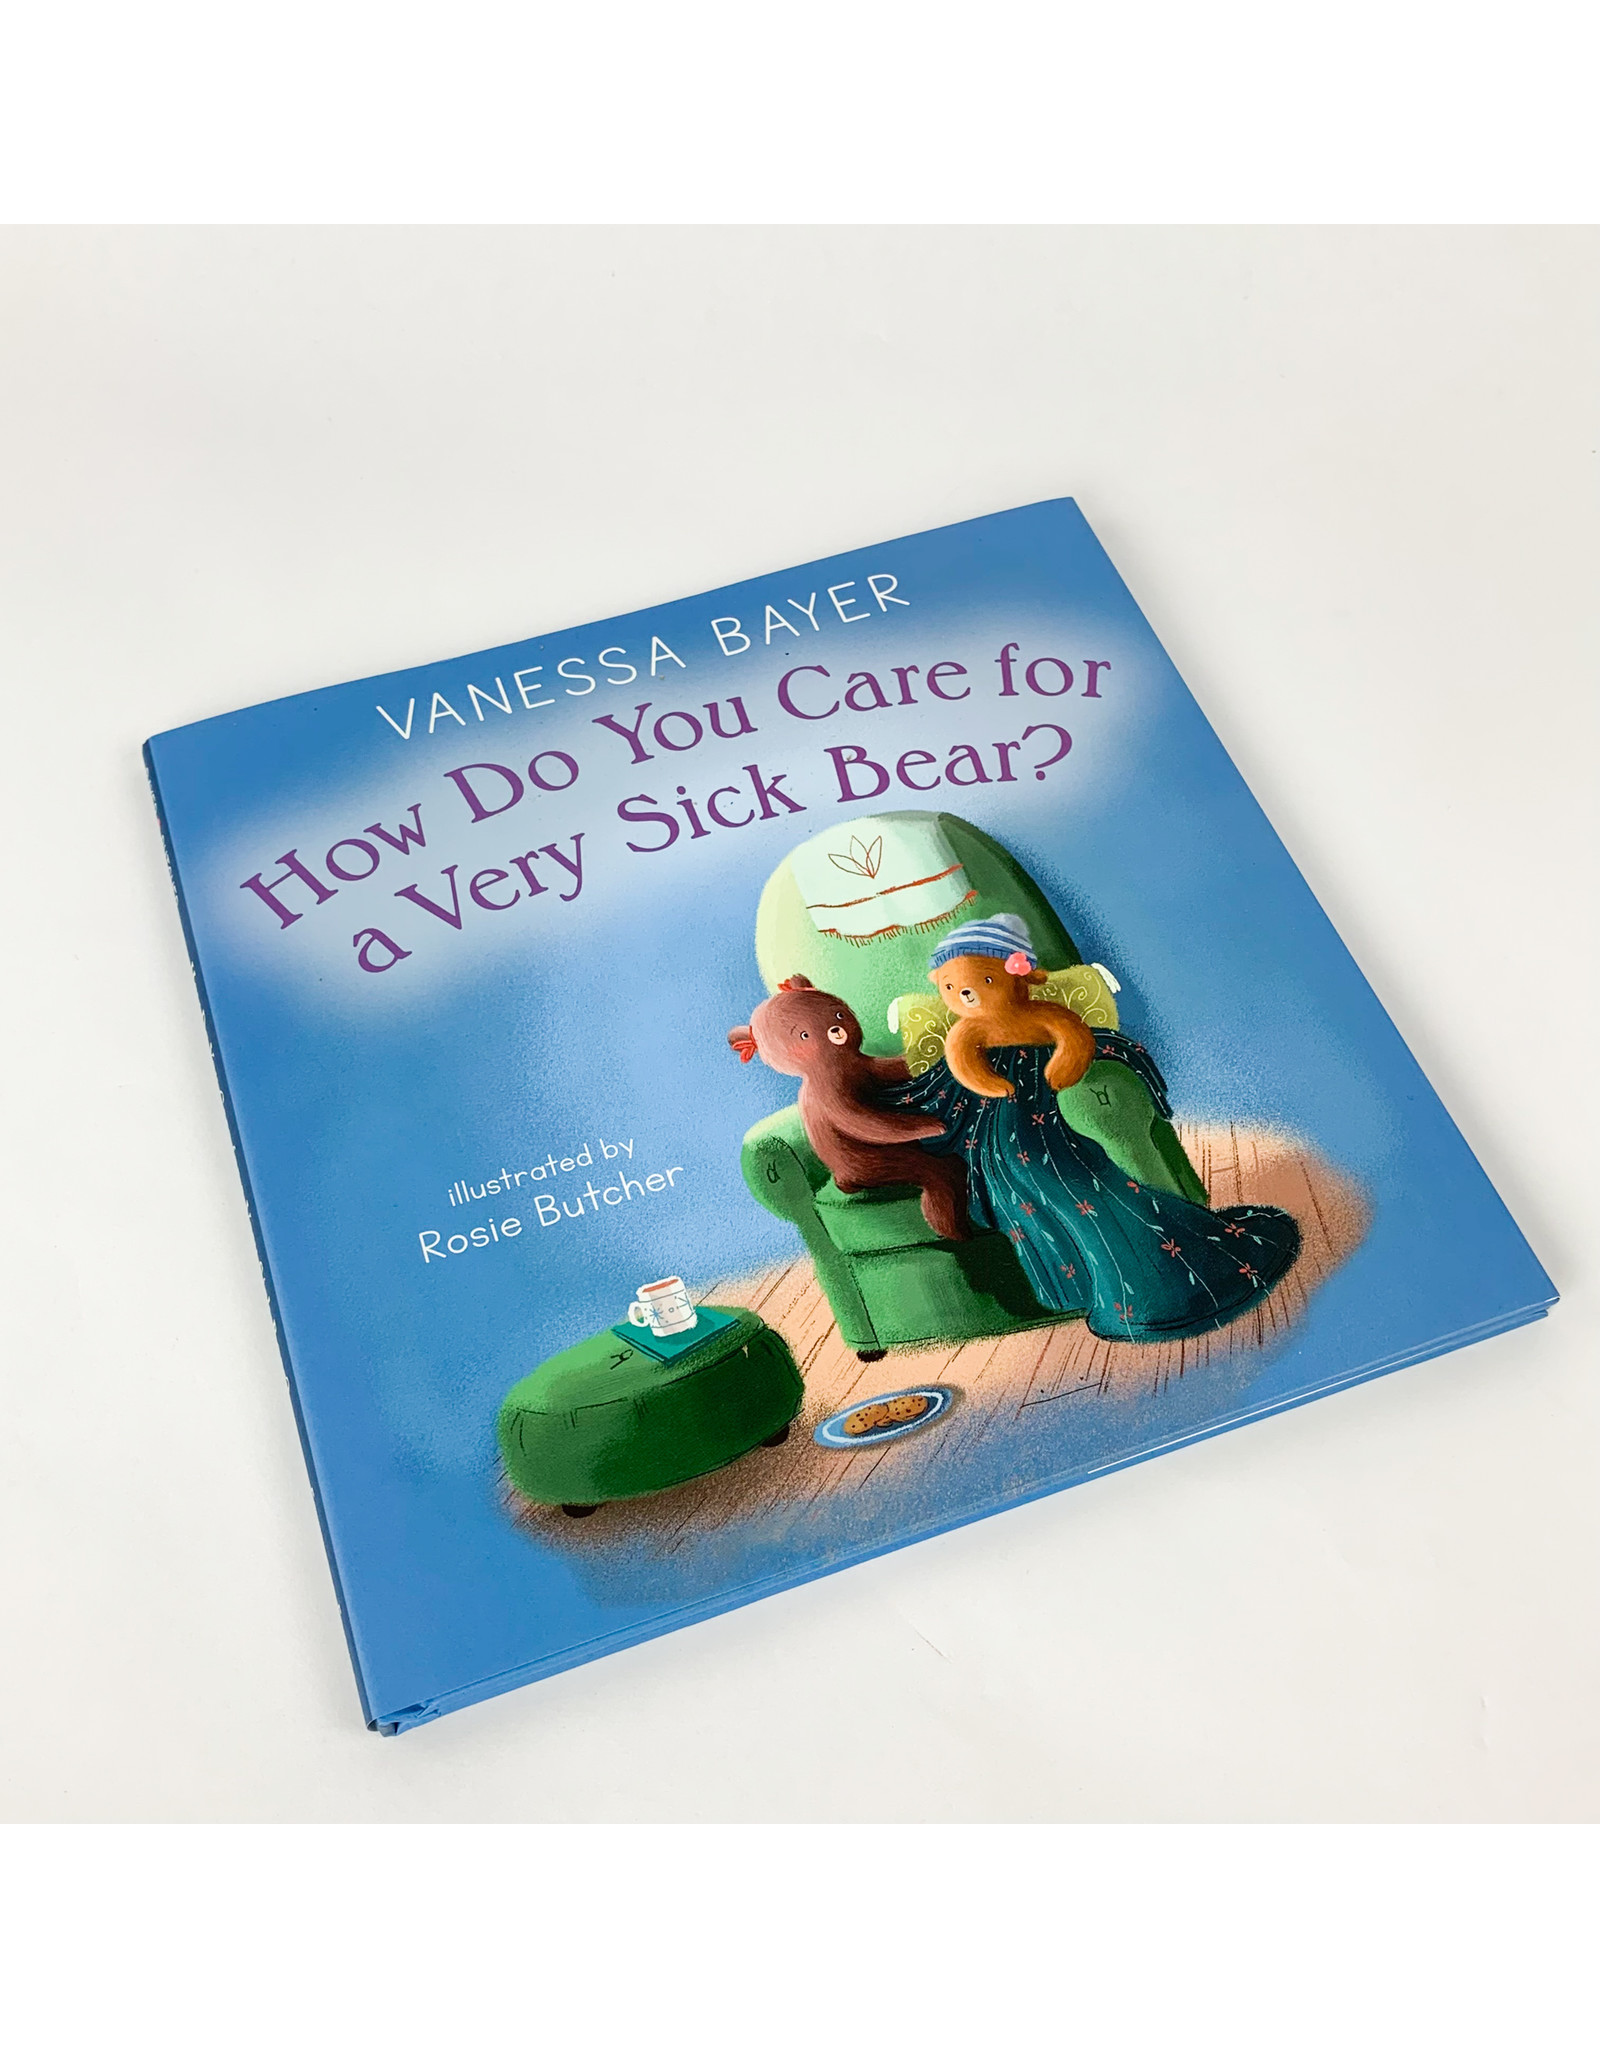 MacMillan How do you care for a very sick bear?